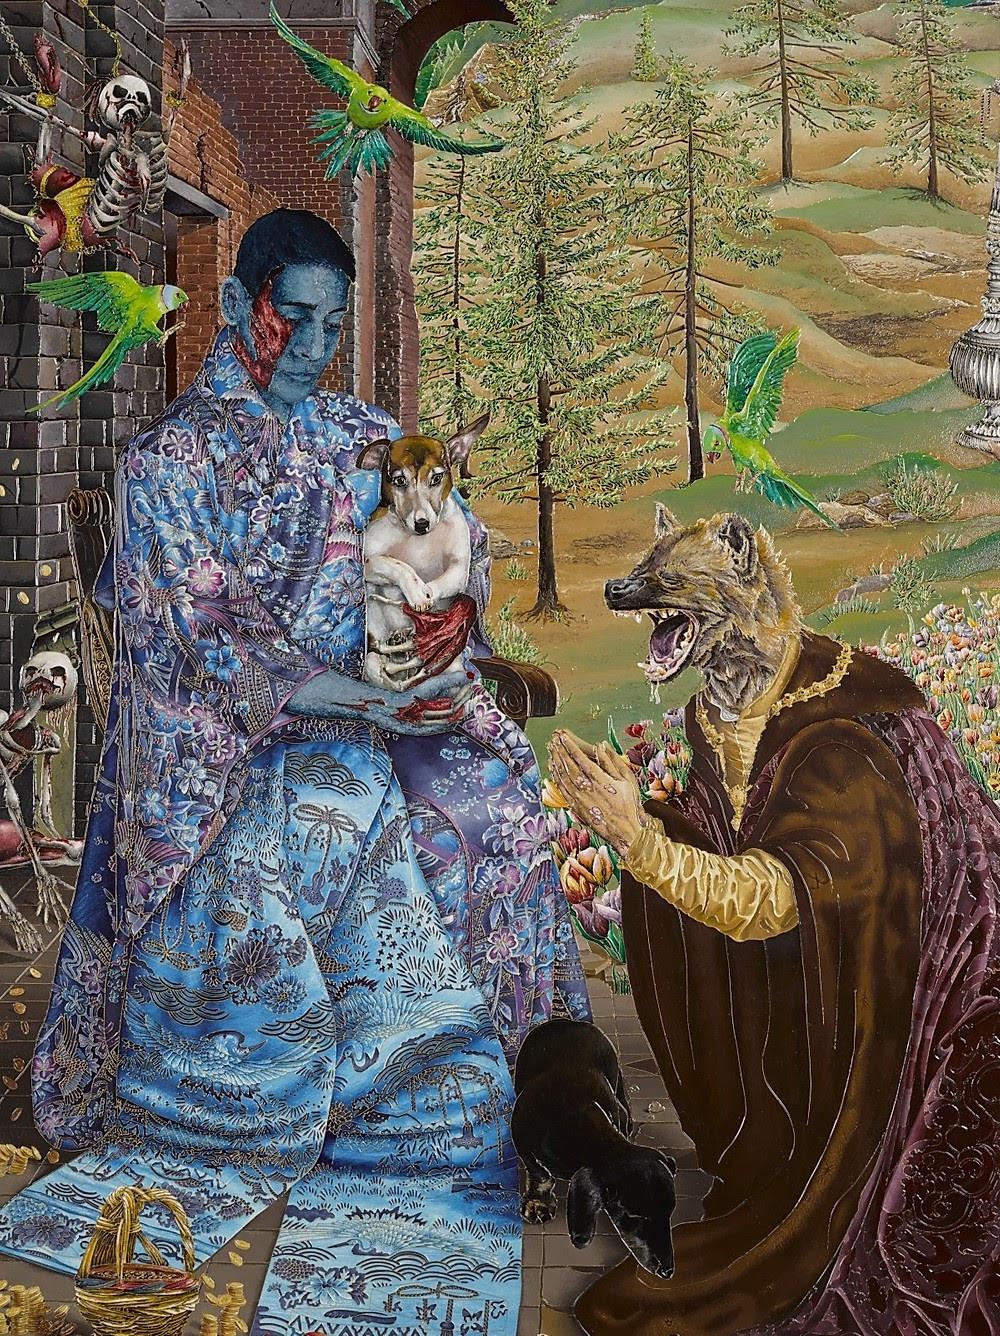 Raqib Shaw, 'The Adoration (After Jan Gossaert)', 2016